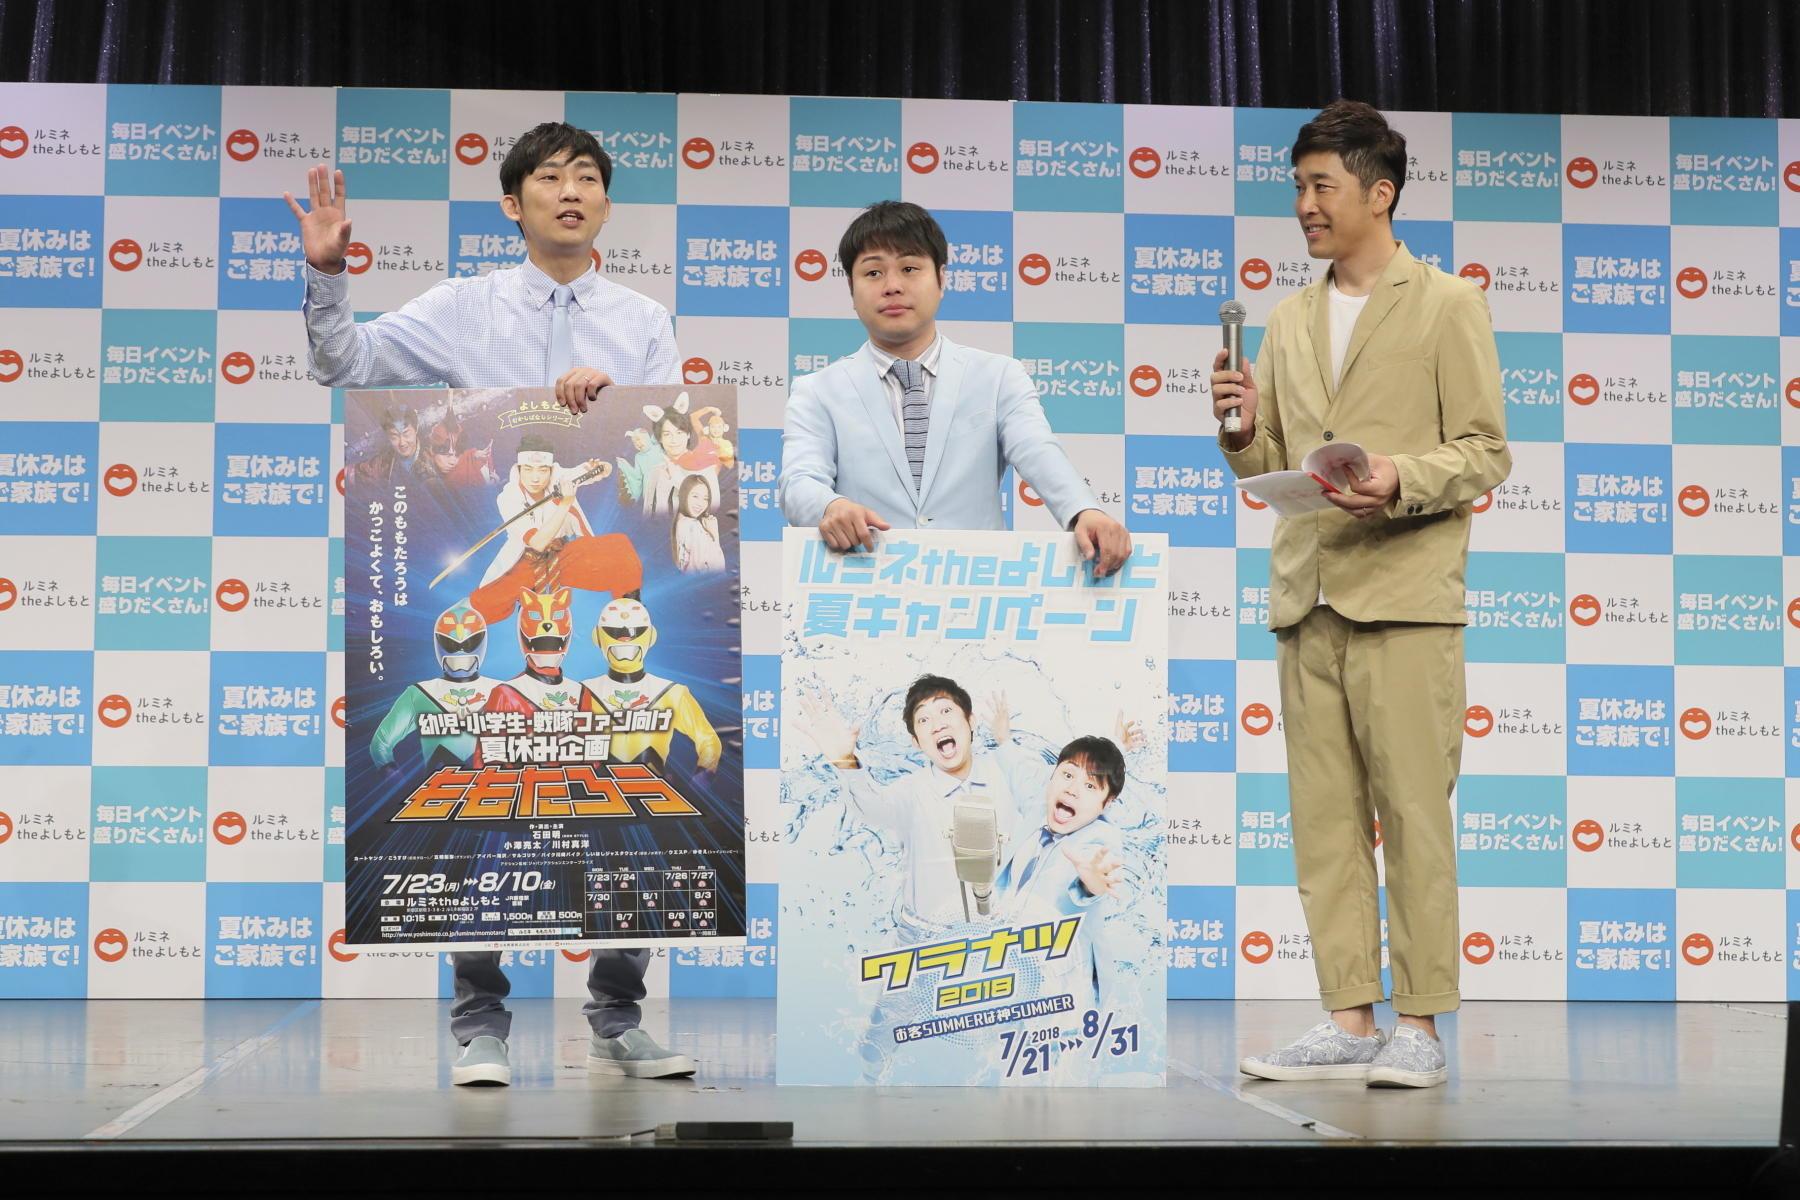 http://news.yoshimoto.co.jp/20180703192412-9bd8119ca561364190269faf9e5c6454dffd151f.jpg